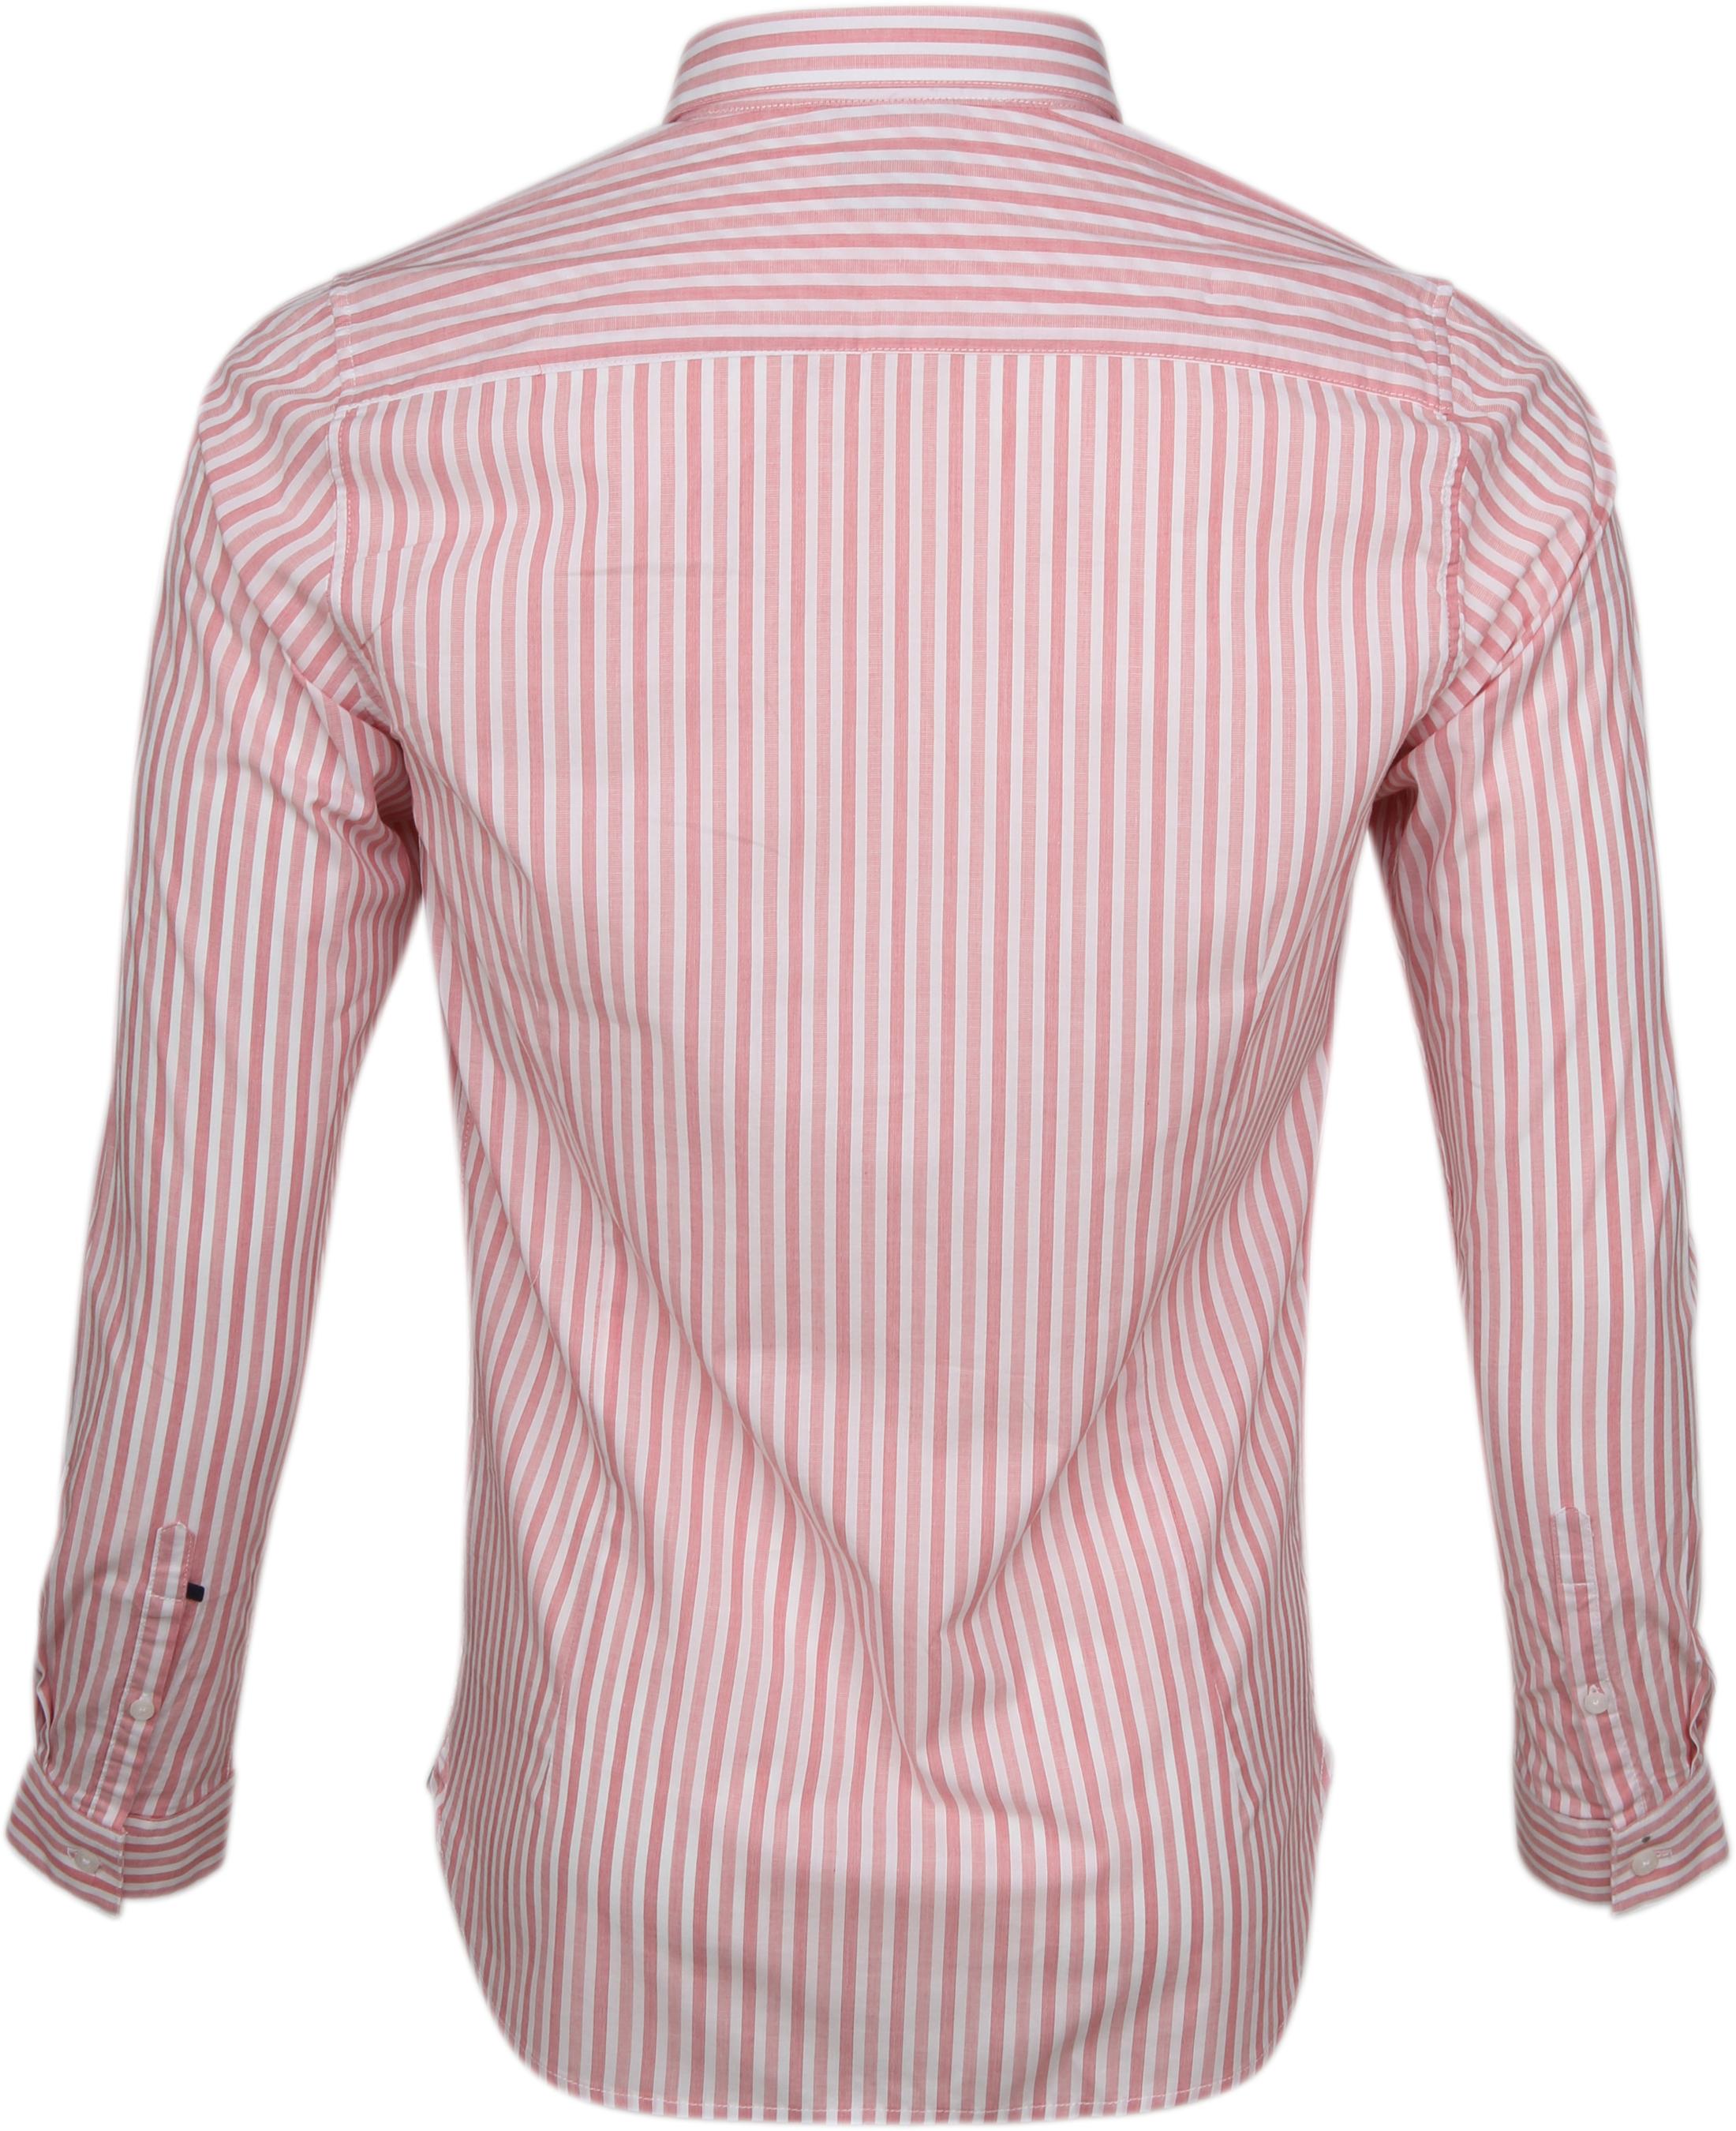 Dstrezzed Shirt Stripes foto 2